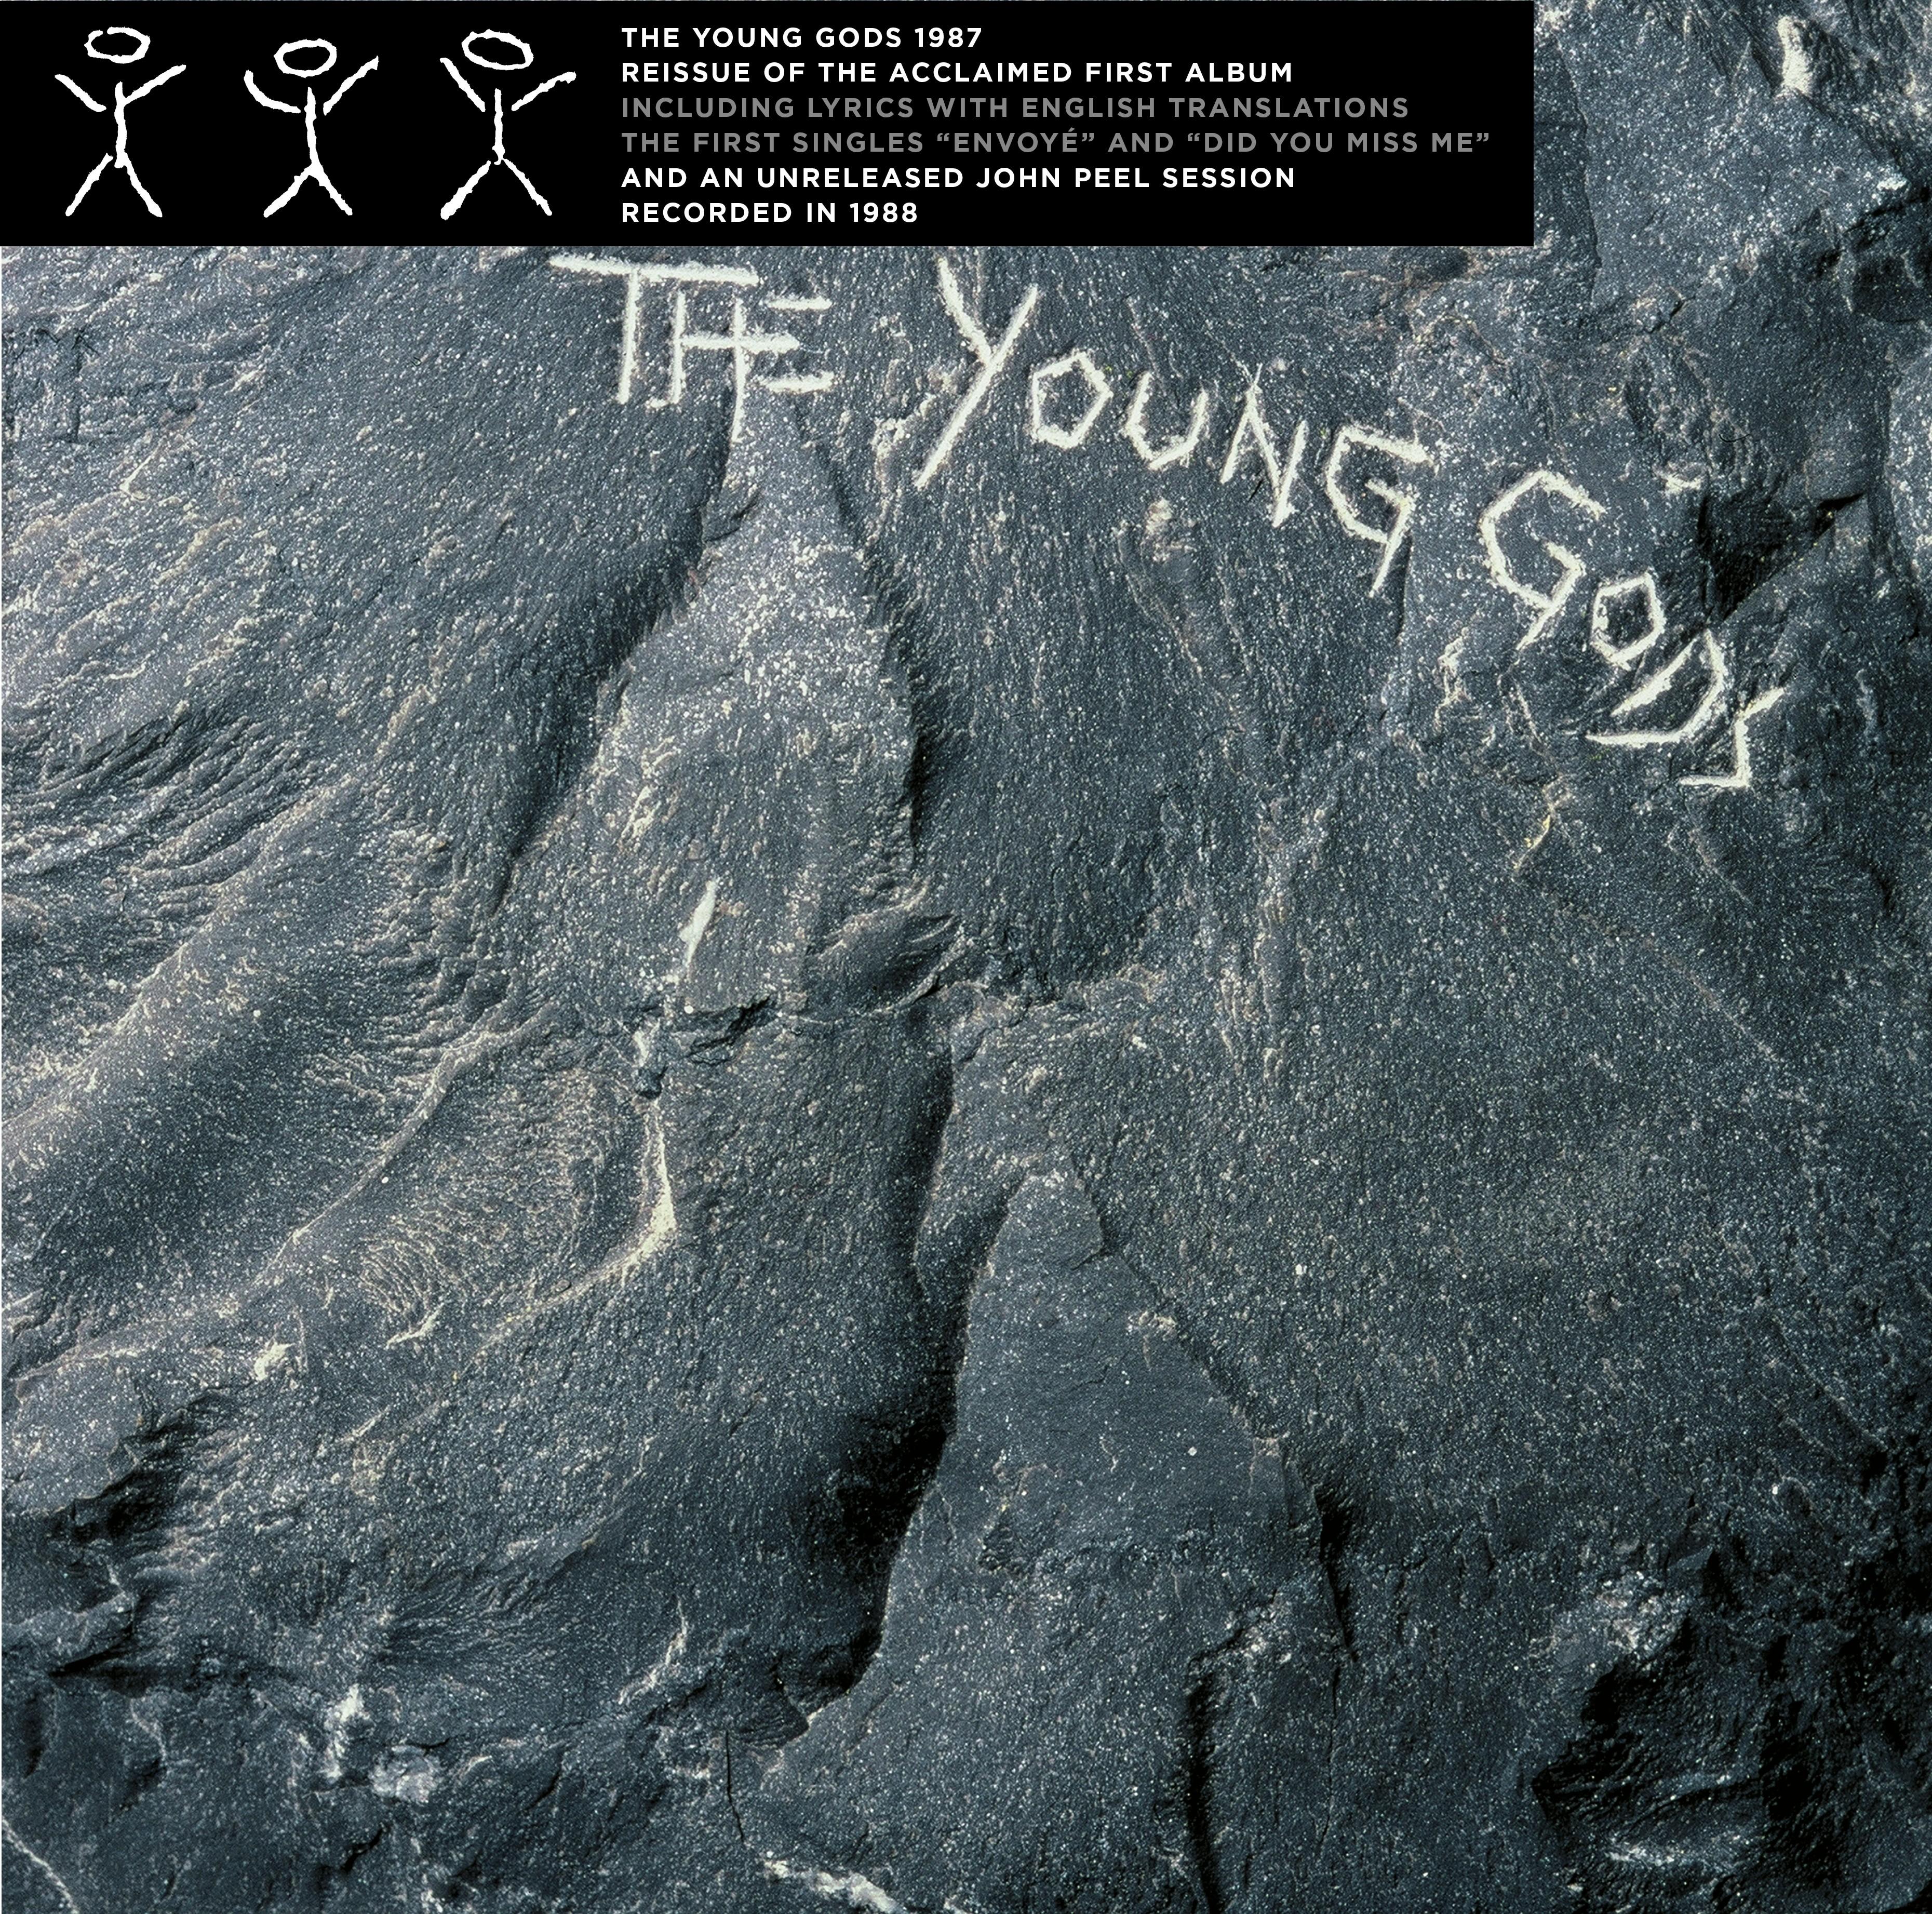 THE YOUNG GODS – Vinyl Reissue